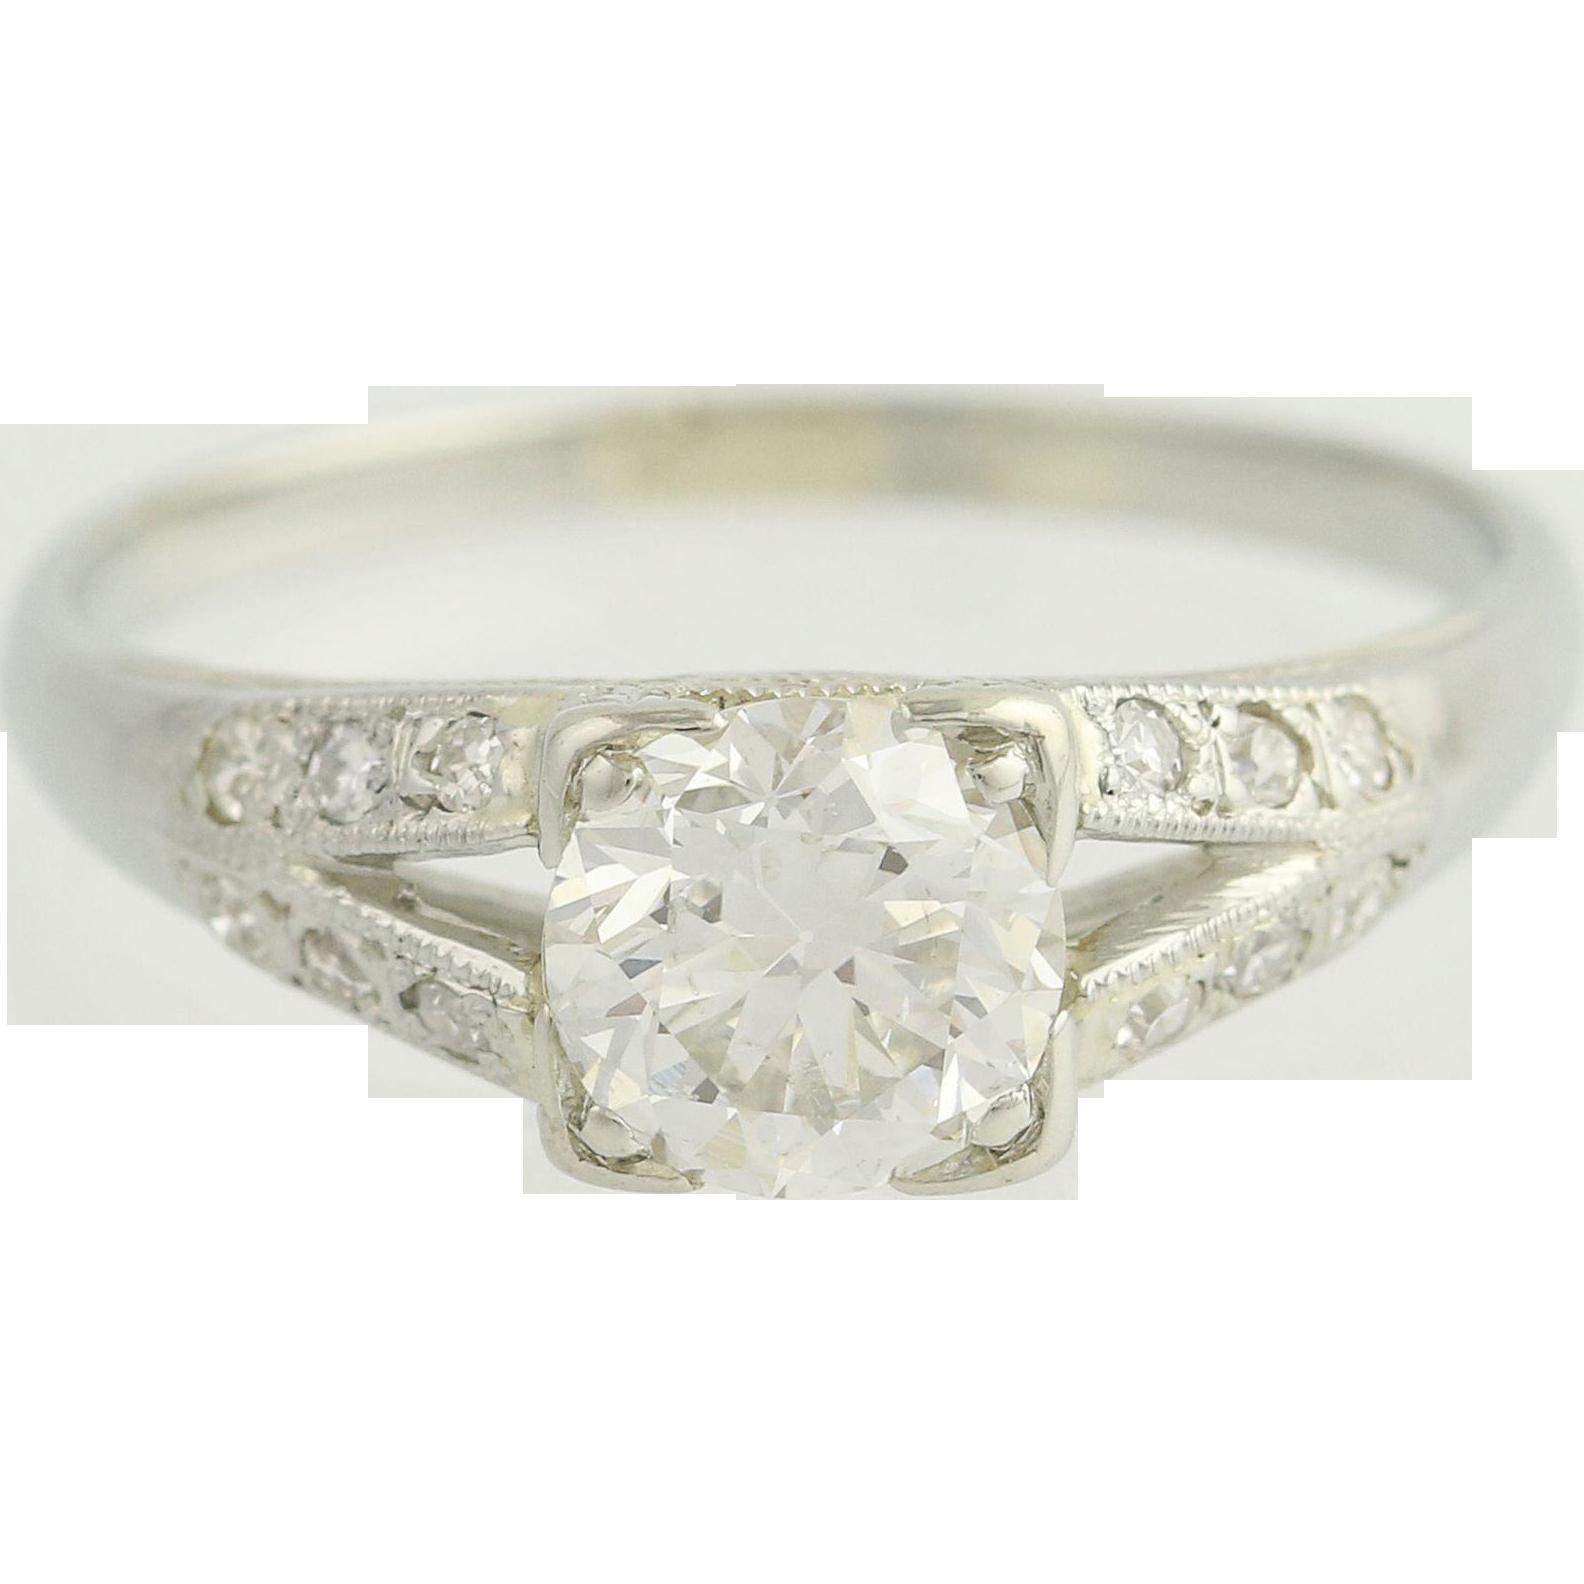 Art Deco Diamond Engagement Ring 18k White Gold Vintage Wedding Jewelry 0.85ctw